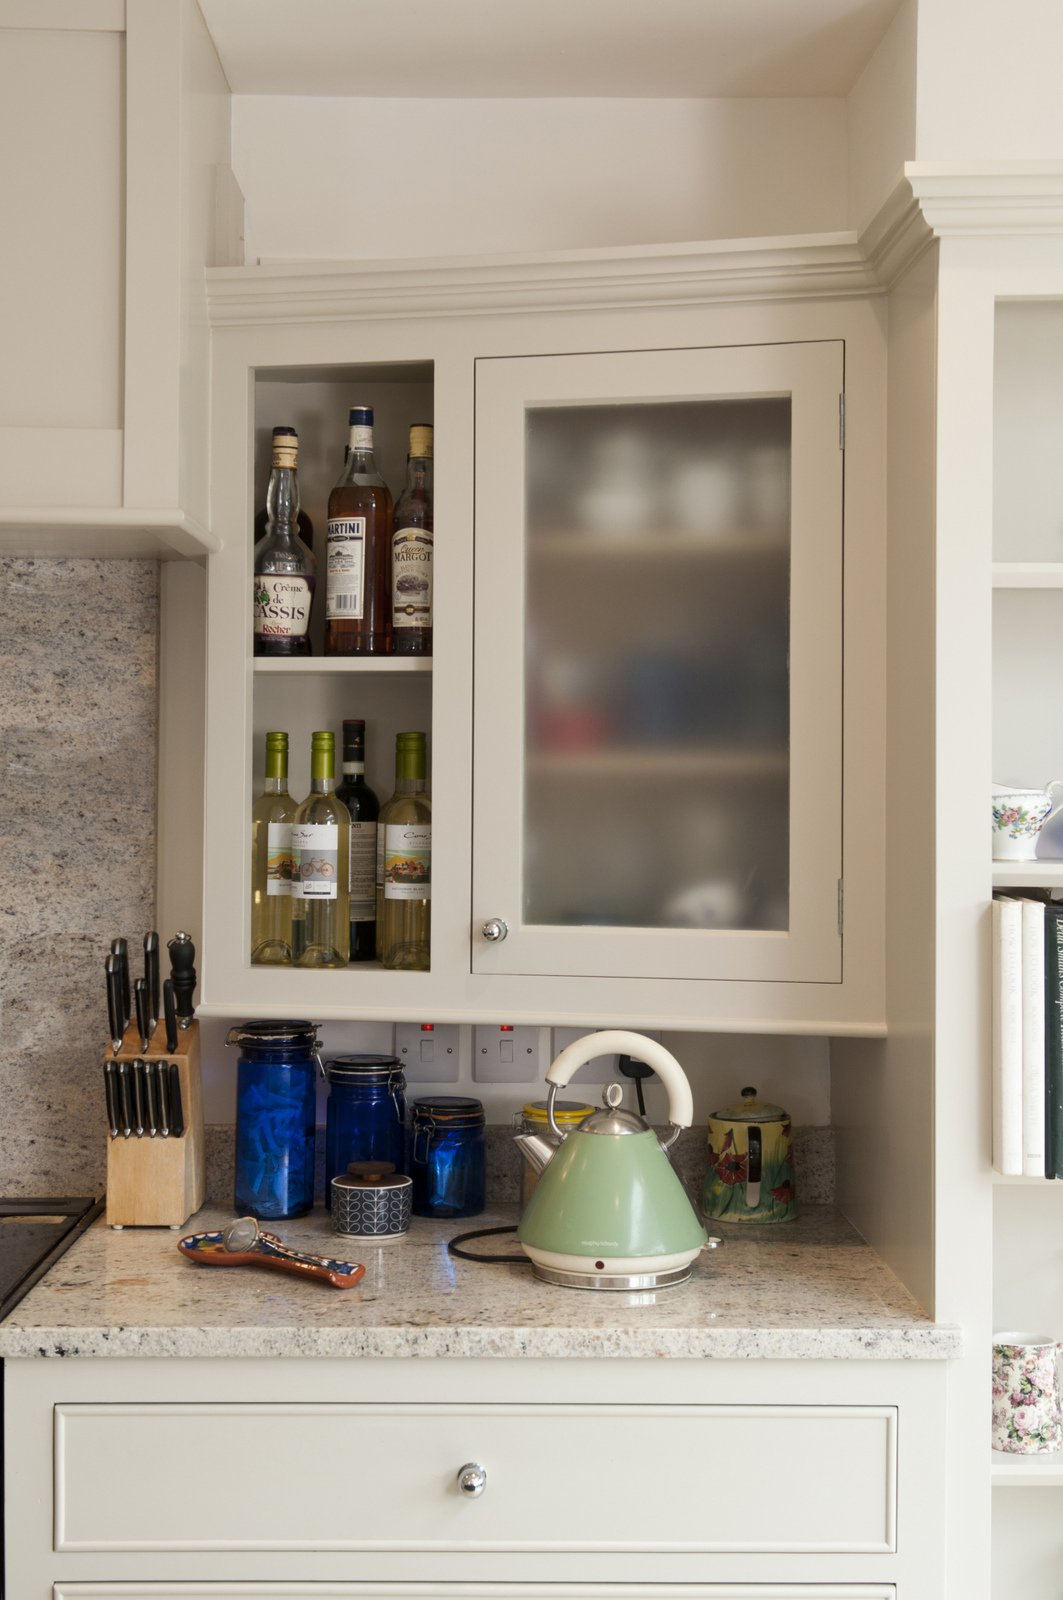 bespoke kitchen shelving.jpg